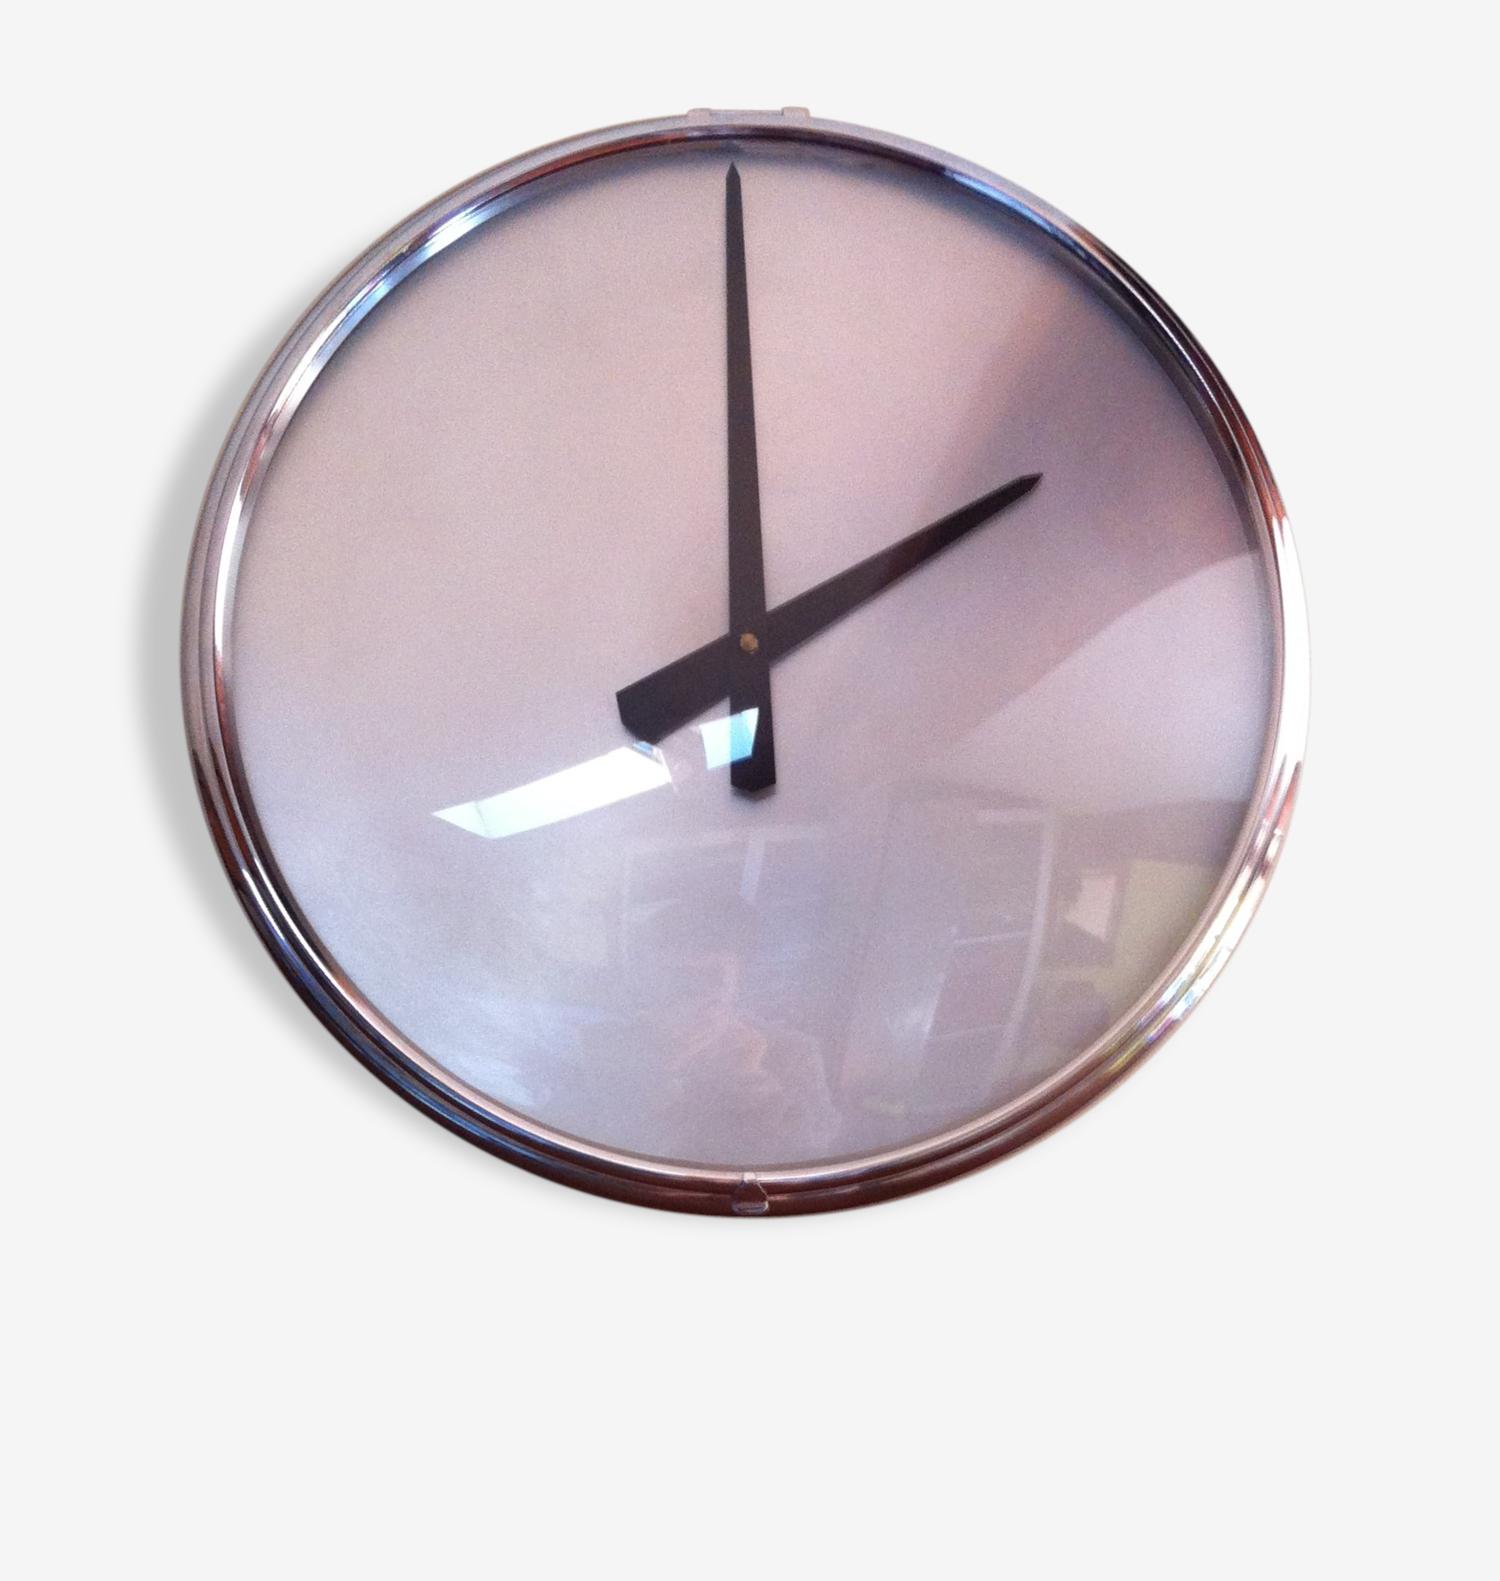 Grande horloge industrielle - Vedette - années 60